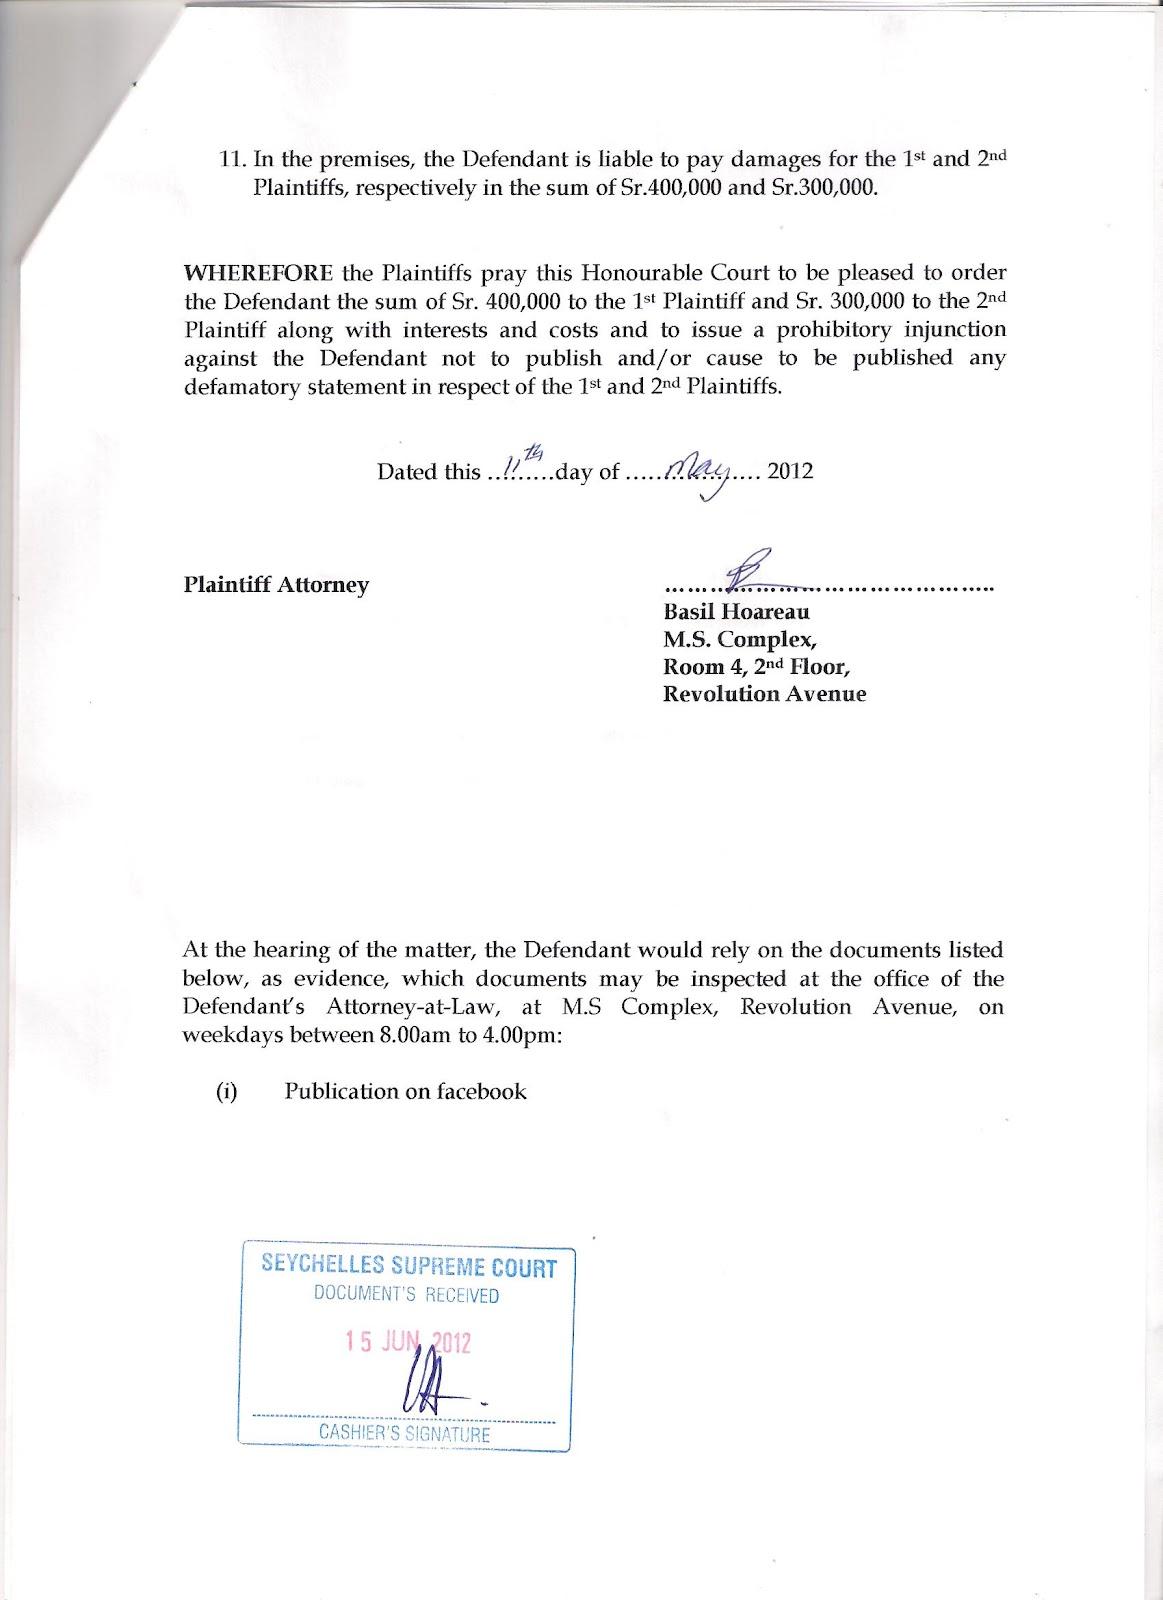 Seychelles reality seselwa unite july 2012 david pierre and veronique hoareau file bogus case against jean paul isaac basil hoareau lawyers up for cartoon network biocorpaavc Choice Image